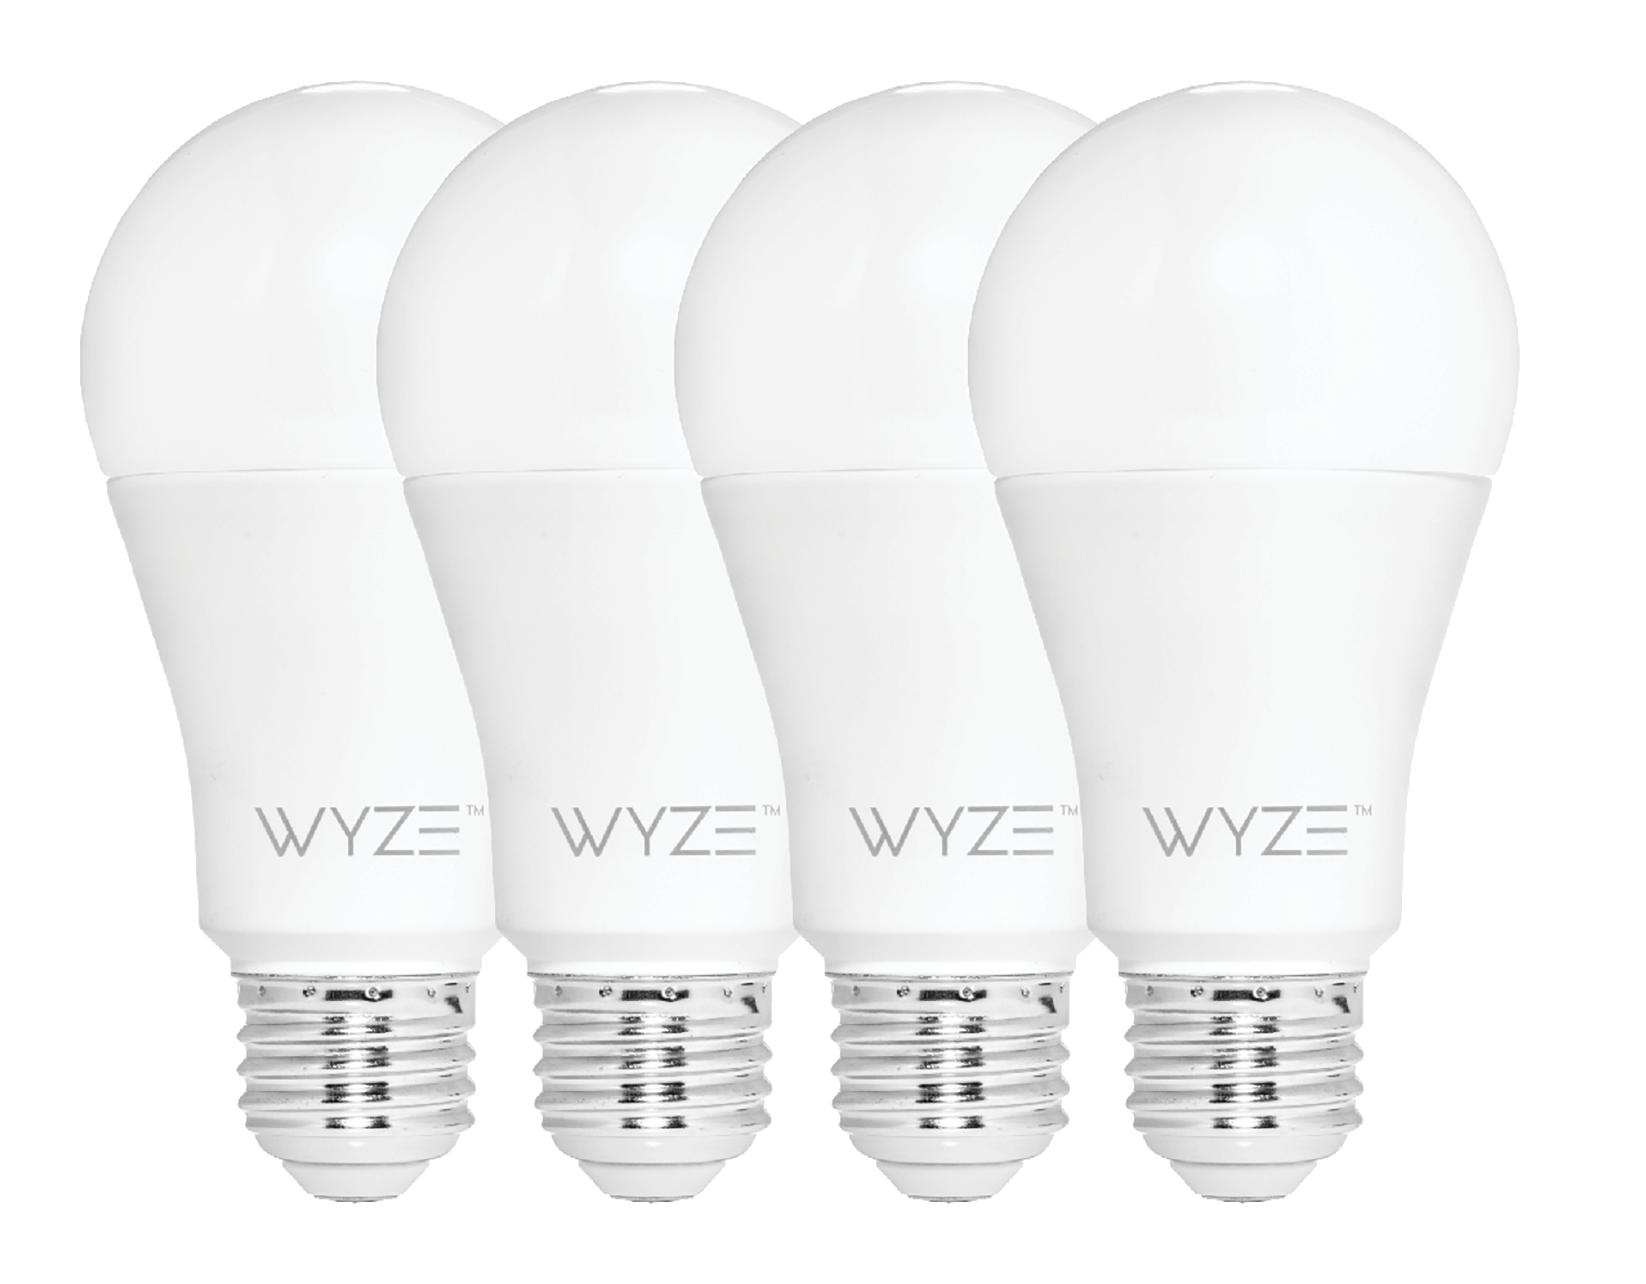 Wyze WiFi Smart Bulbs pk $29.99 (pre-order) +shipping/tax $37.98